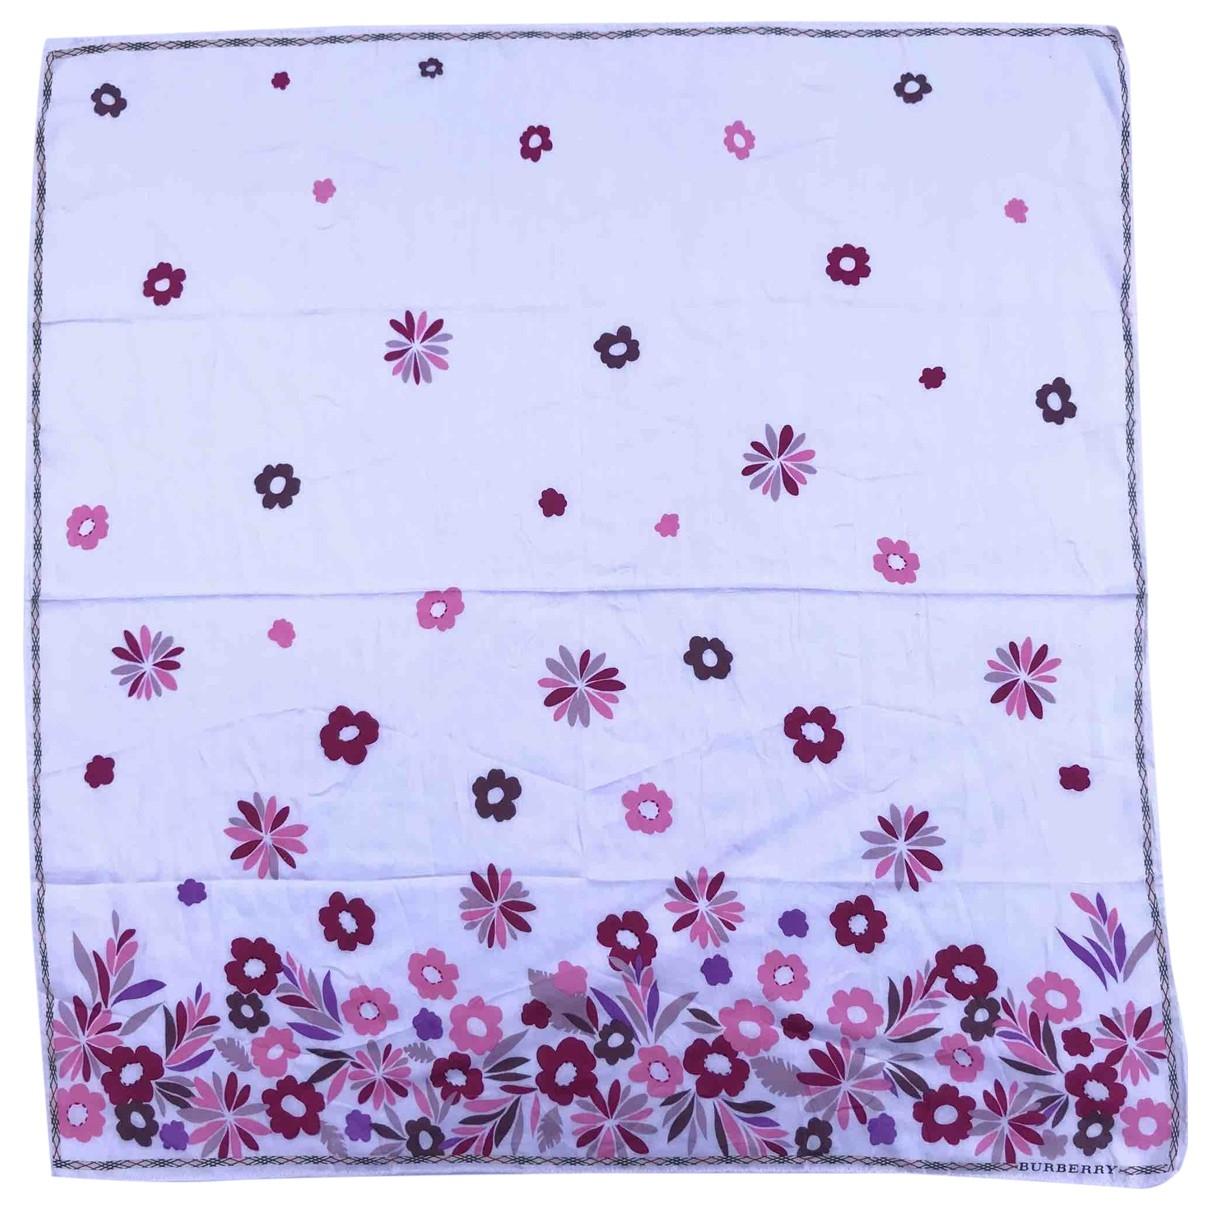 Burberry \N Silk handkerchief for Women \N